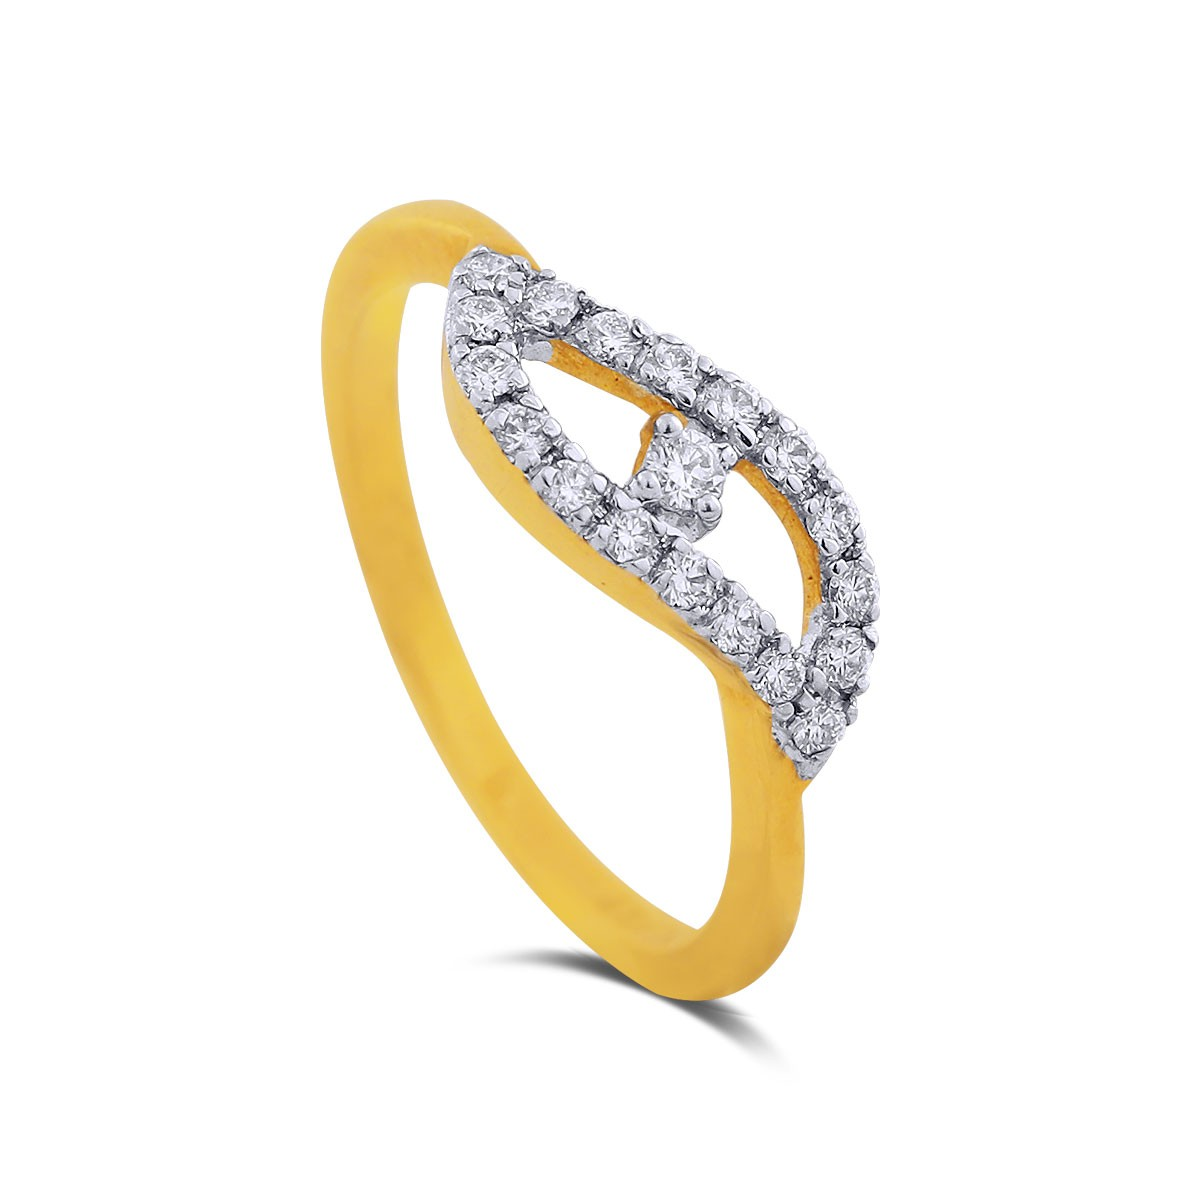 Terese Yellow Gold Diamond Ring